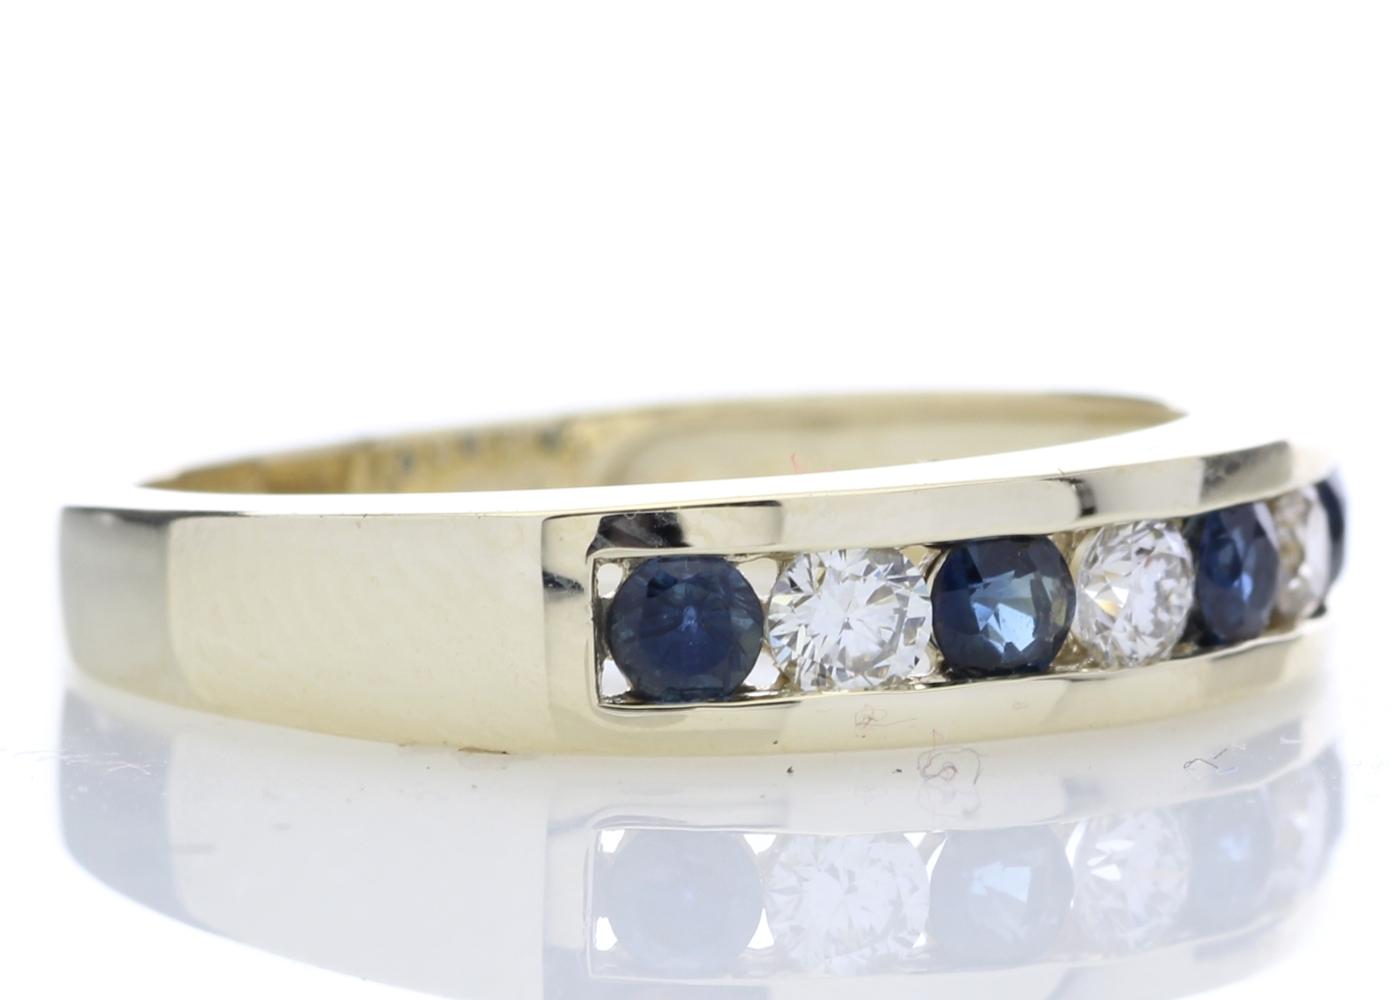 9ct Yellow Gold Channel Set Semi-Eternity Diamond Ring 0.25 Carats - Image 4 of 5